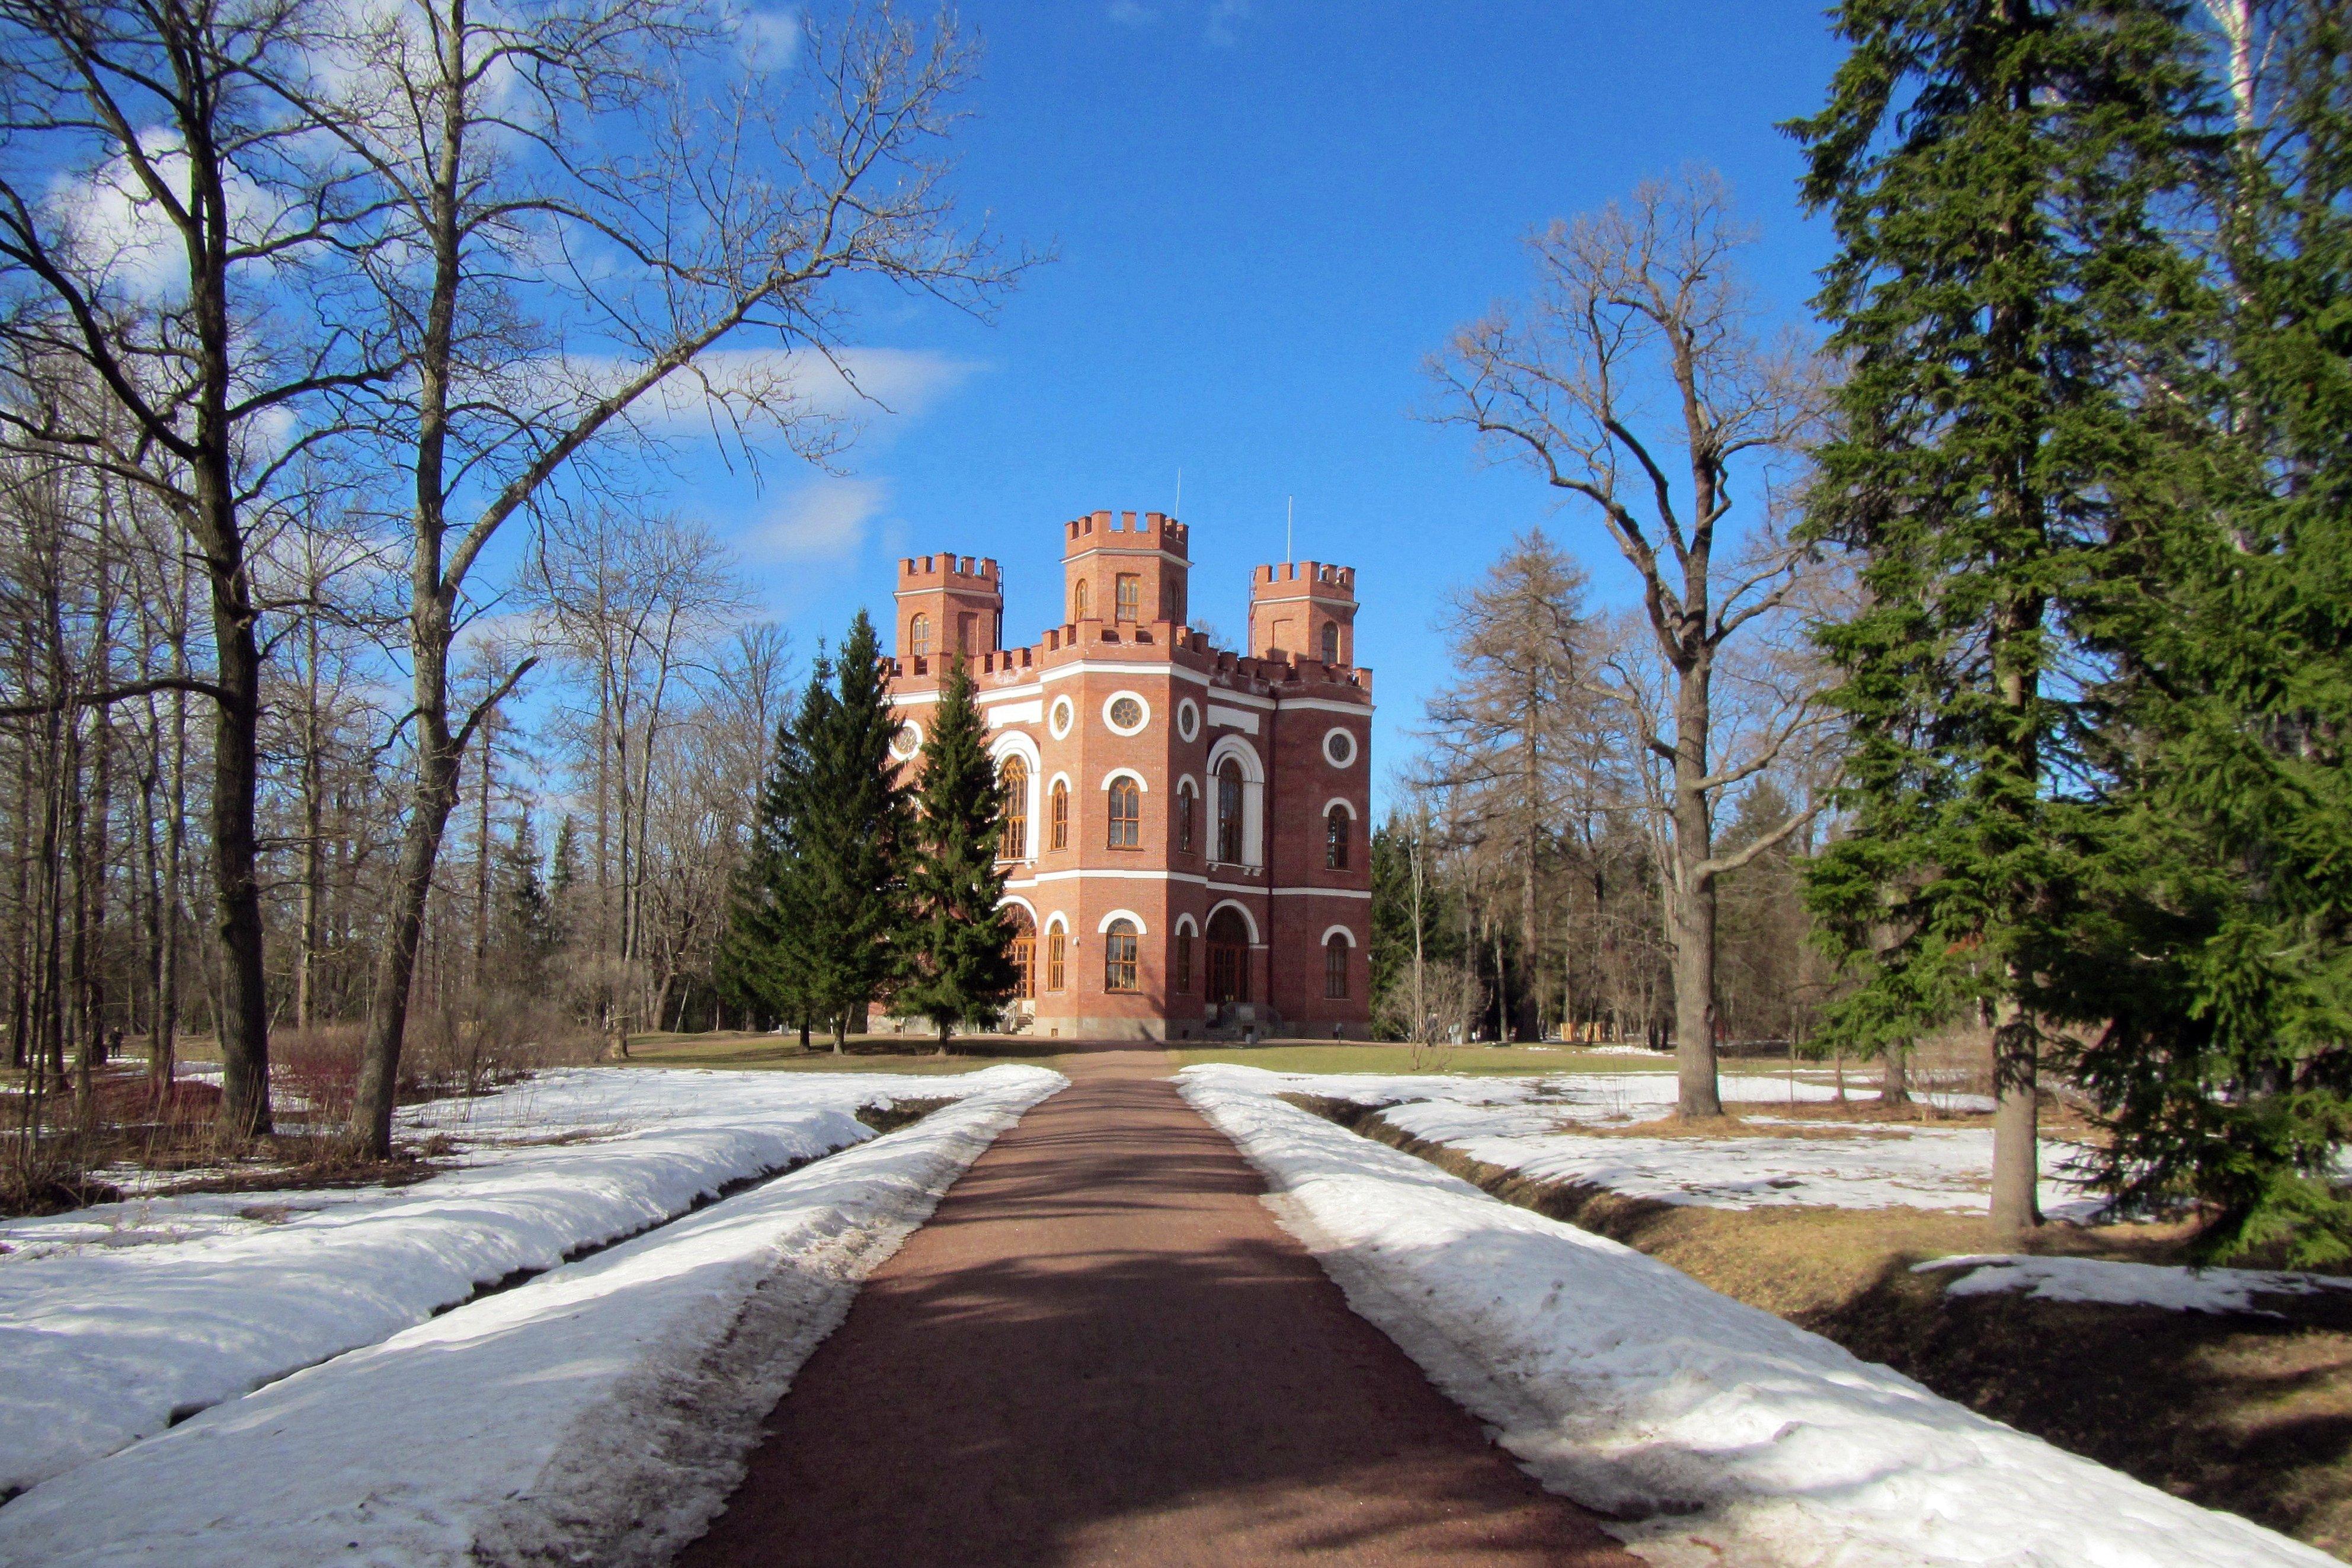 место, дворец в александровском парке пушкин фото вид бизнеса